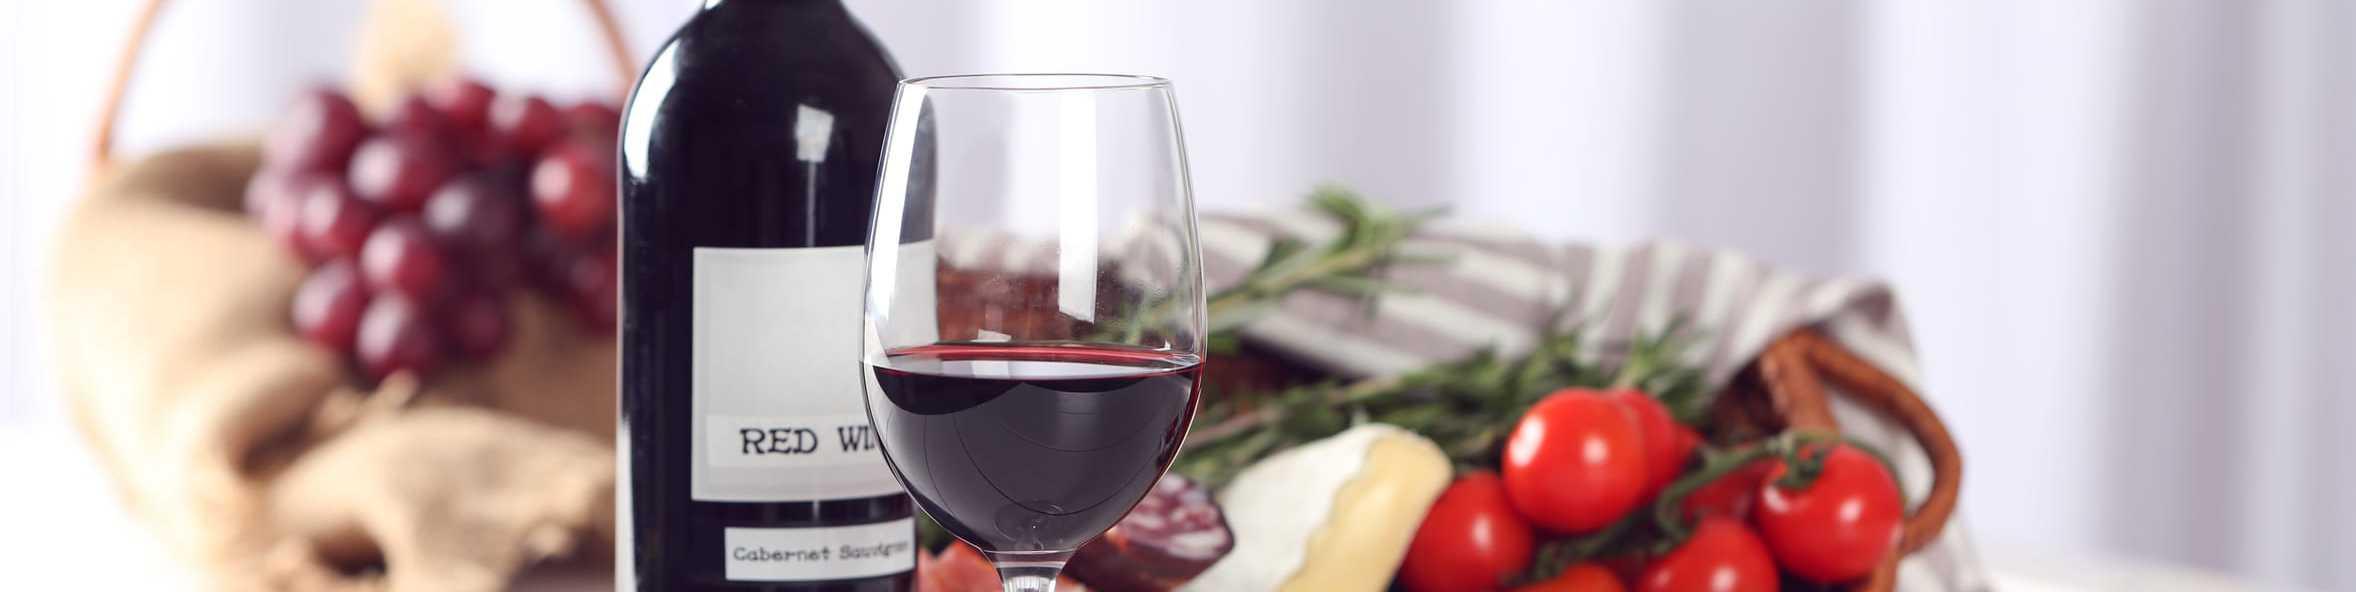 Rotwein, reifer Käse, Tomaten, Histaminintoleranz